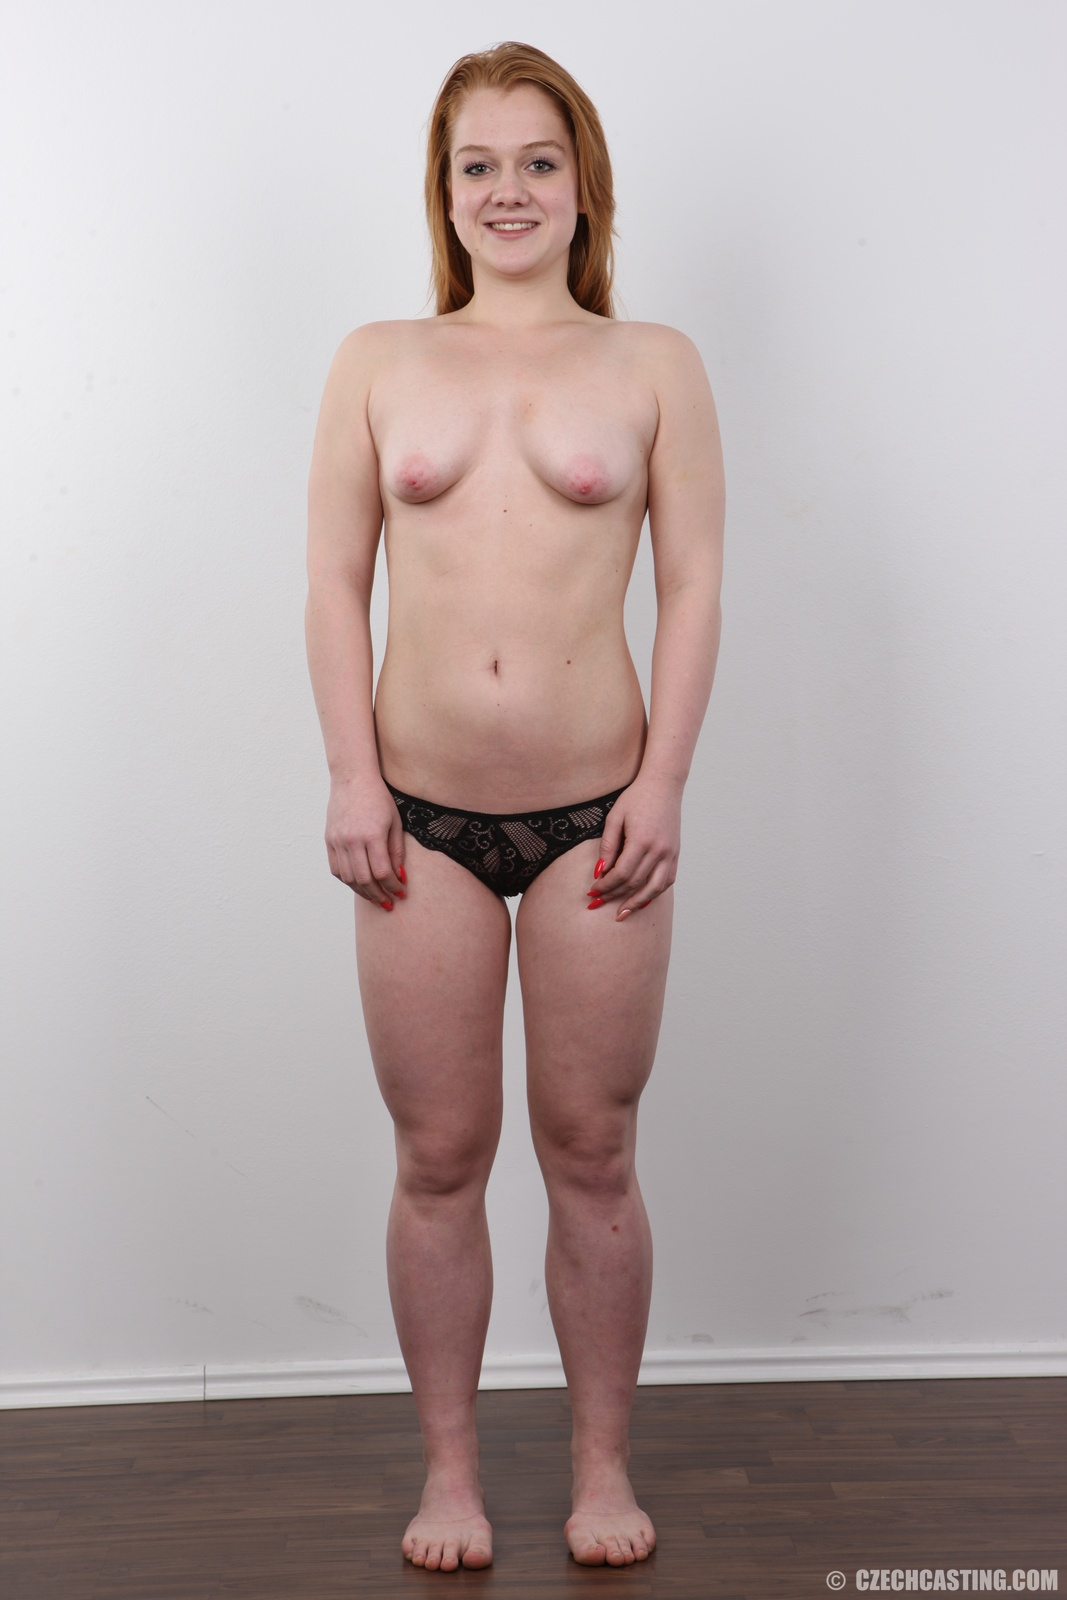 wpid-18-year-old-eliska-casting-photos21.jpg